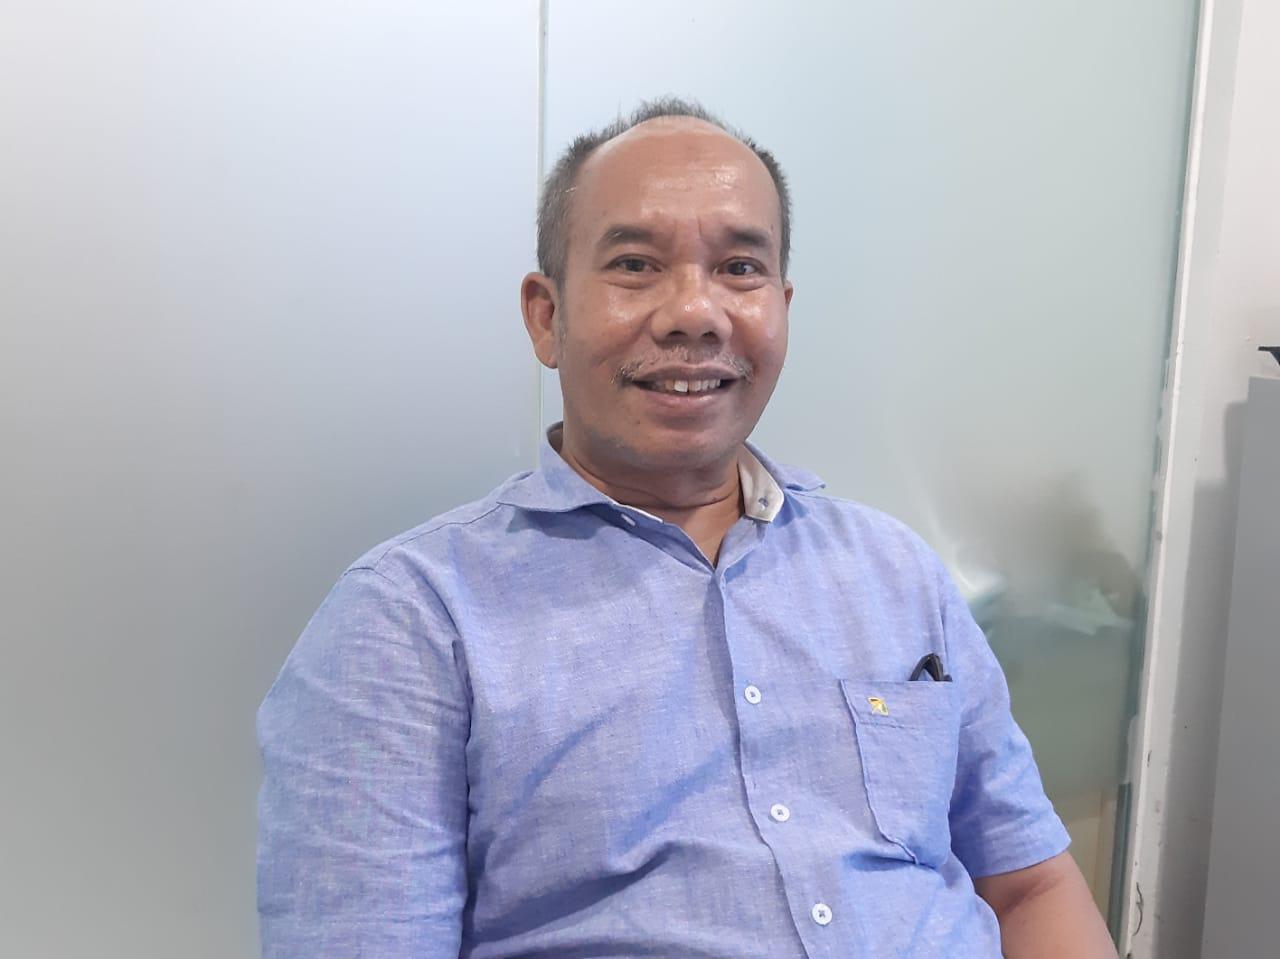 PPKM Diperpanjang, Jamiluddin Ritonga:Dapat Membahayakan Keamanan